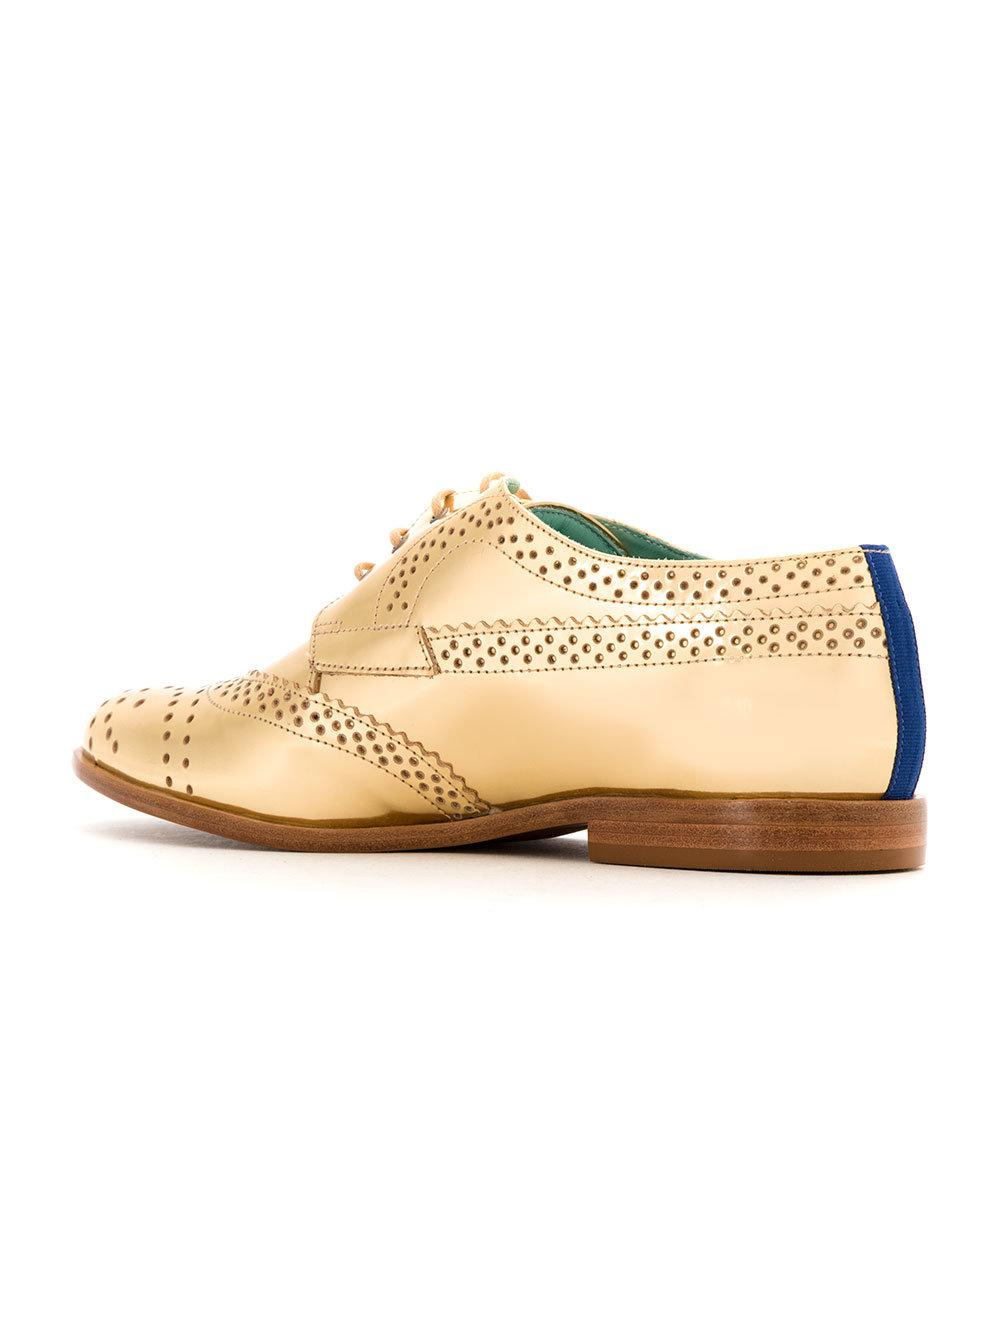 leather oxfords - Yellow & Orange Blue Bird Shoes 9AxS1